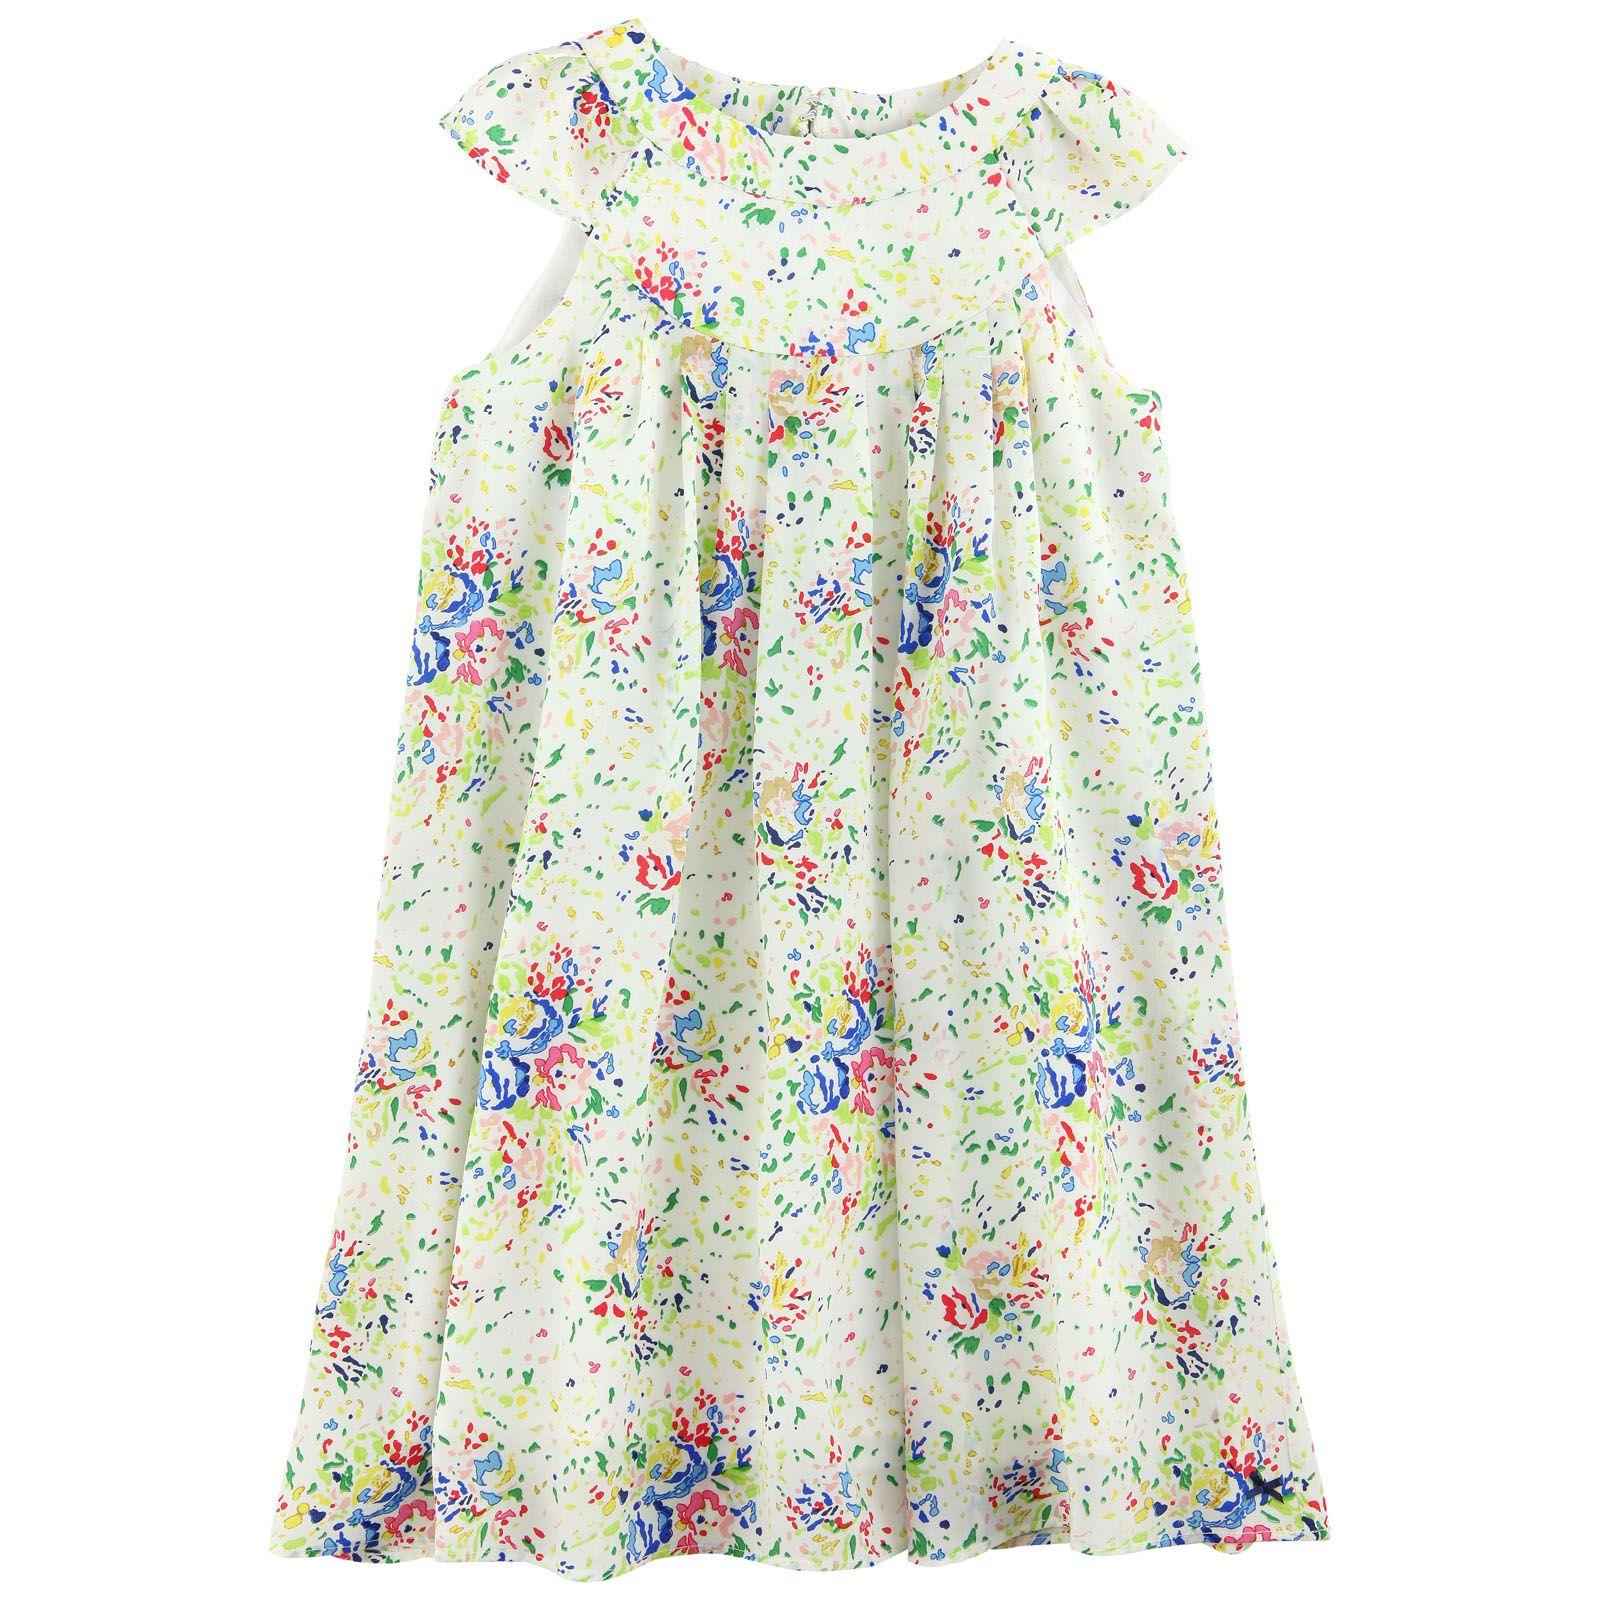 Paul smith junior flowerprinted silk dress kids fashion